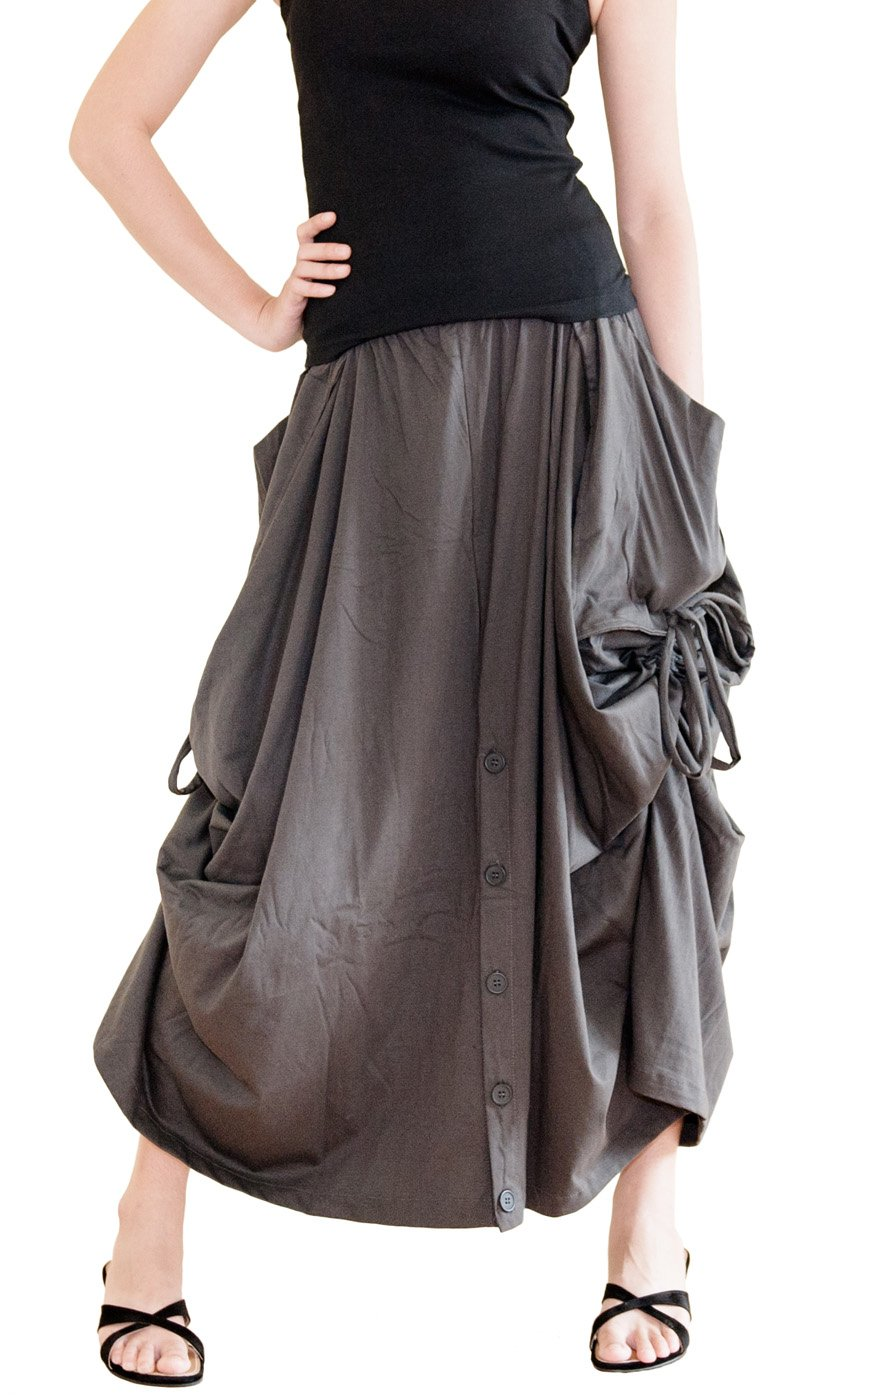 BohoHill Convertible Maxi Skirt Pants Cotton Jersey Versatile Skirt  Charcoal (One Size)